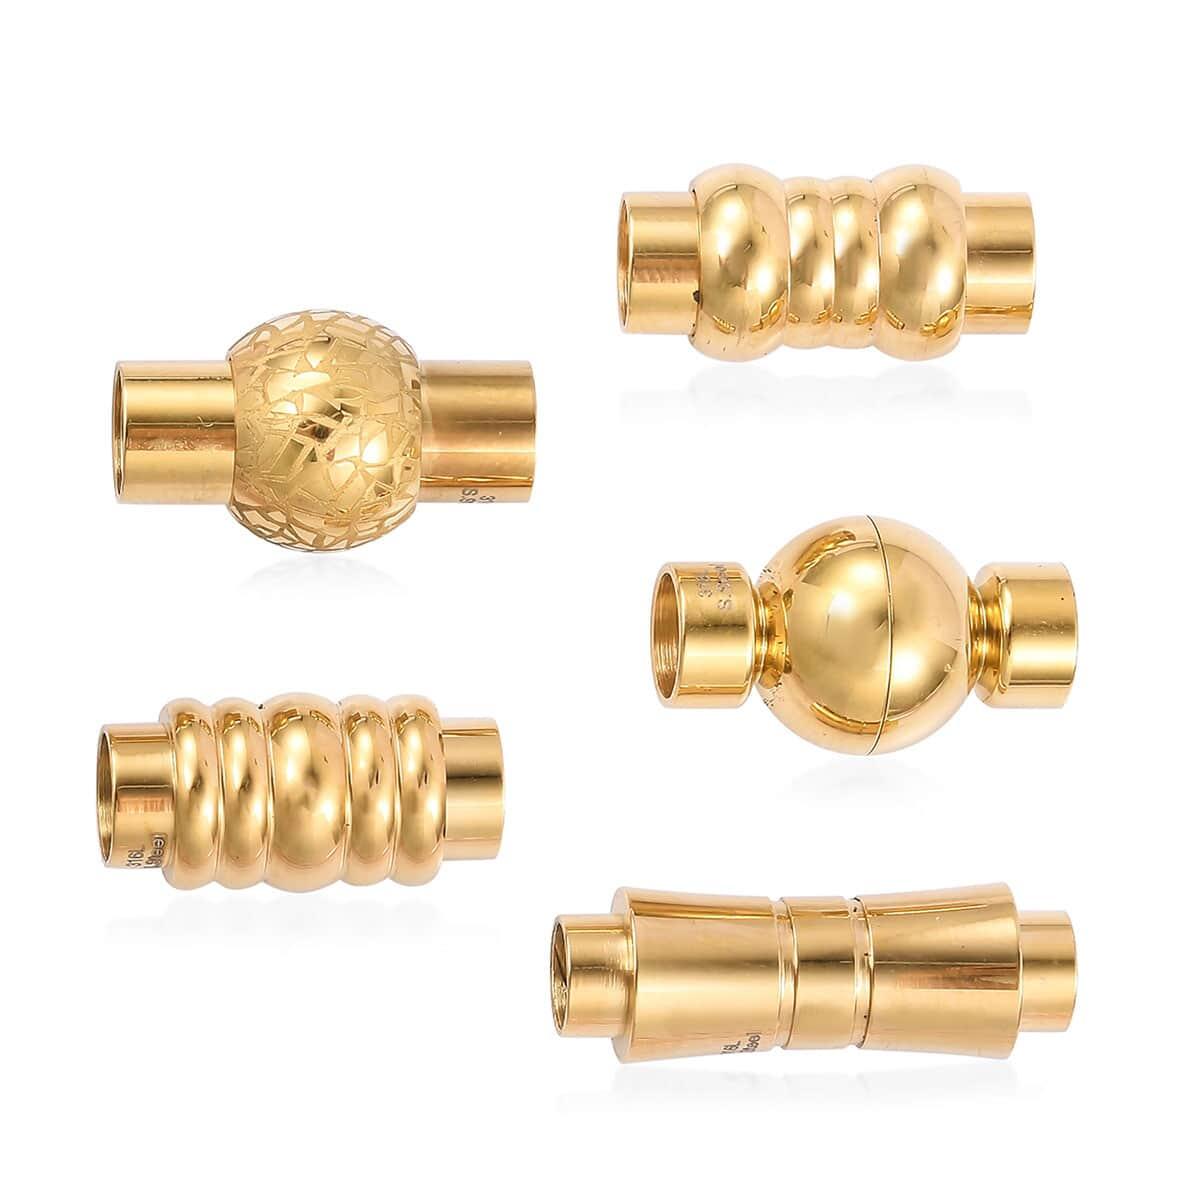 FR53 Sterling Silver 925 Ring Clip Reducer Adjuster Fits 3.00mm Wide Ring Shank